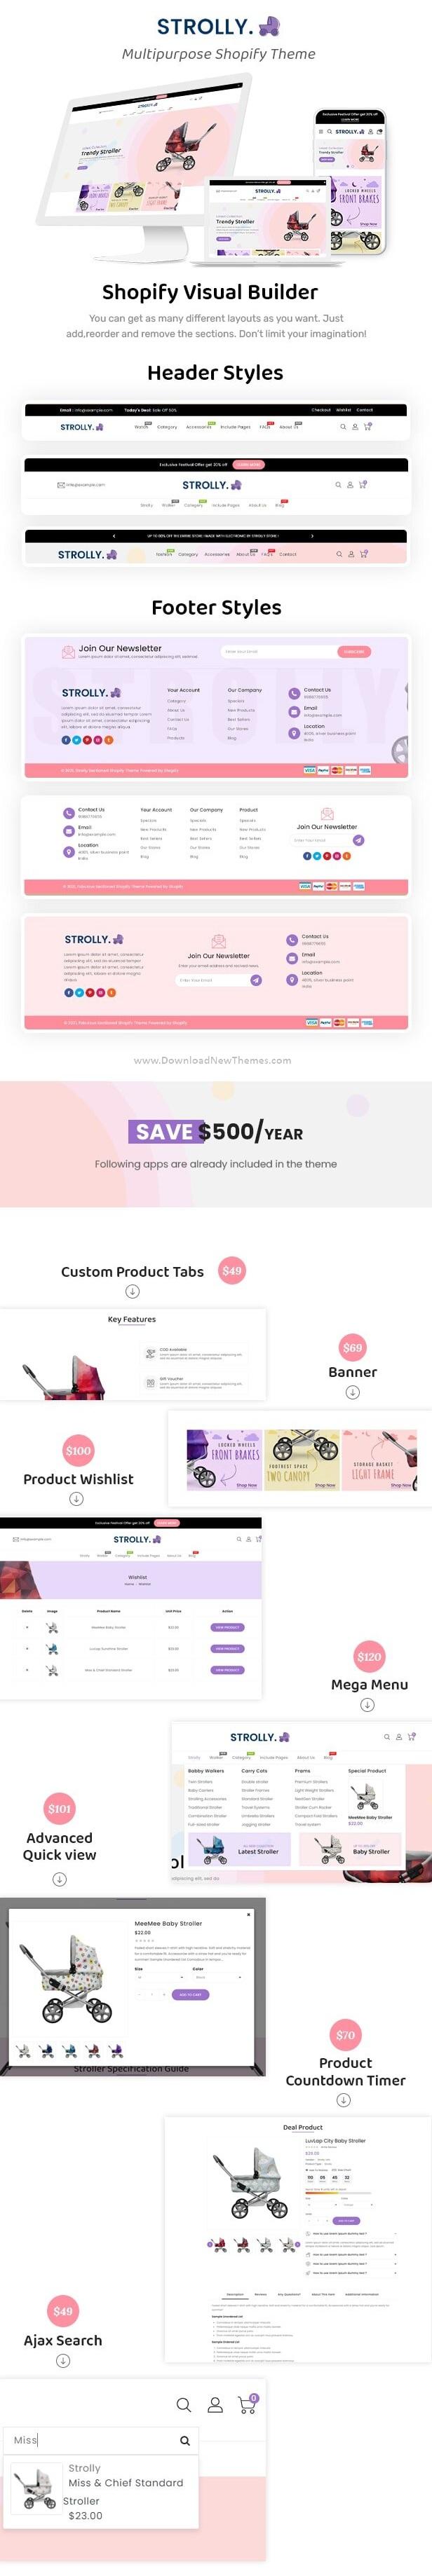 Single Product Shopify Theme